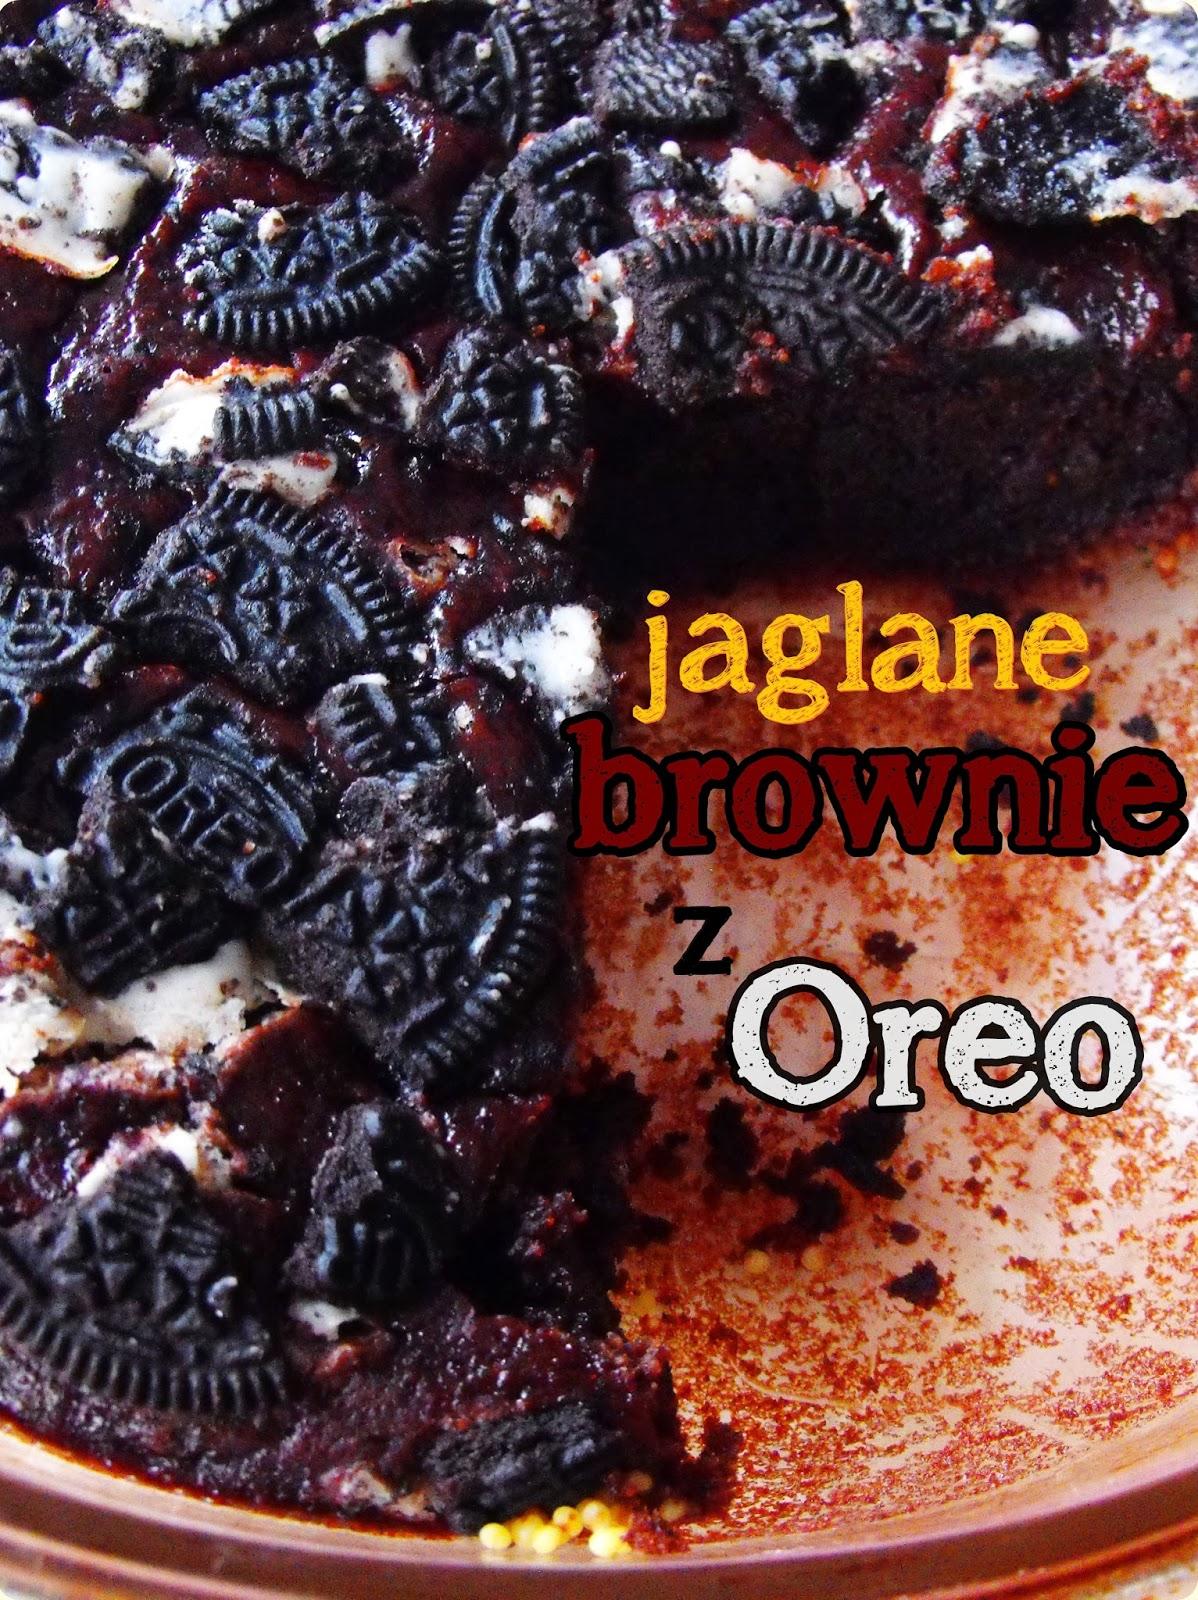 http://teczawsloiku.blogspot.com/2013/11/zdrowe-jaglane-brownie-z-ciastkami-oreo.html